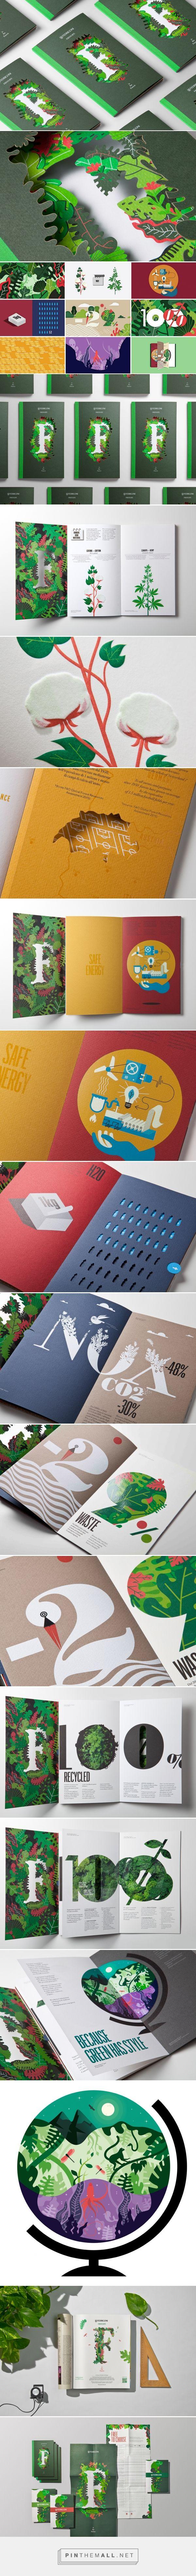 Fedrigoni — Freelife Visual Book on Behance - created via https://pinthemall.net